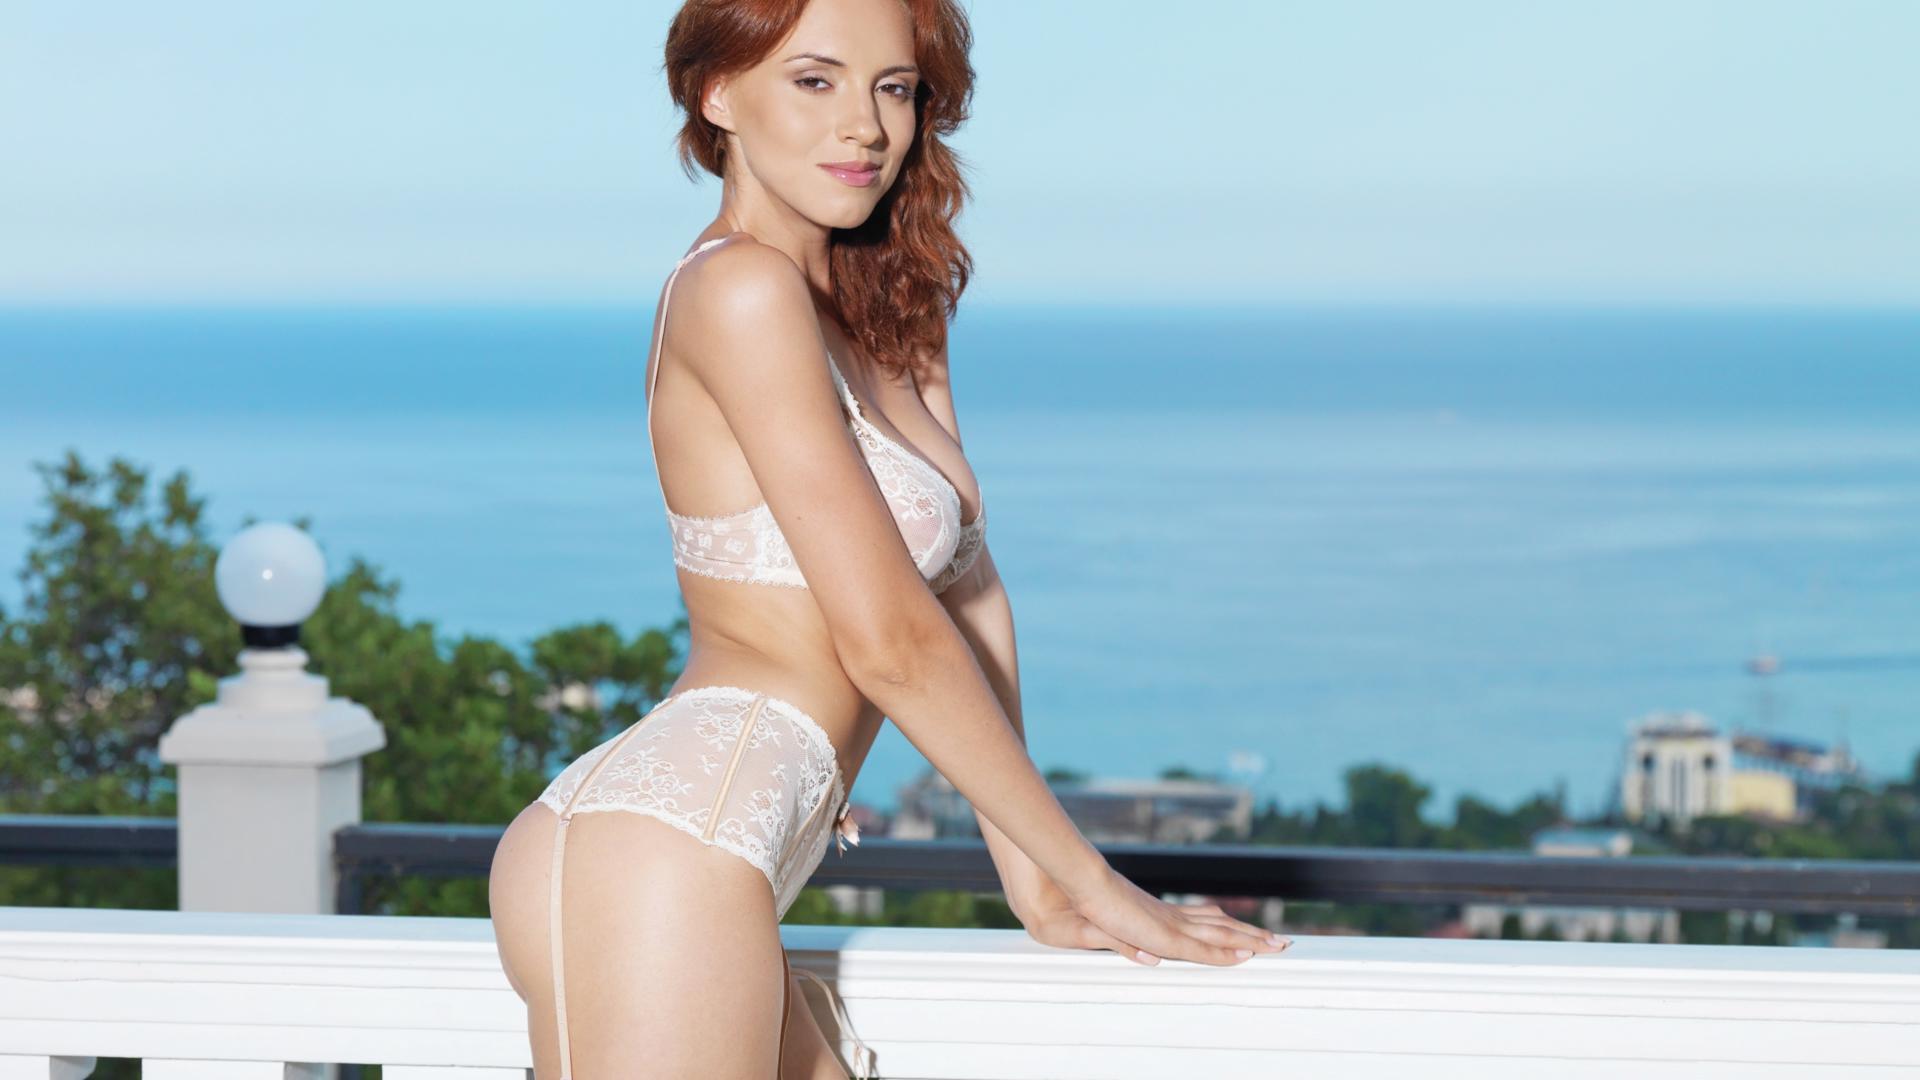 Sarah michelle gallah naked